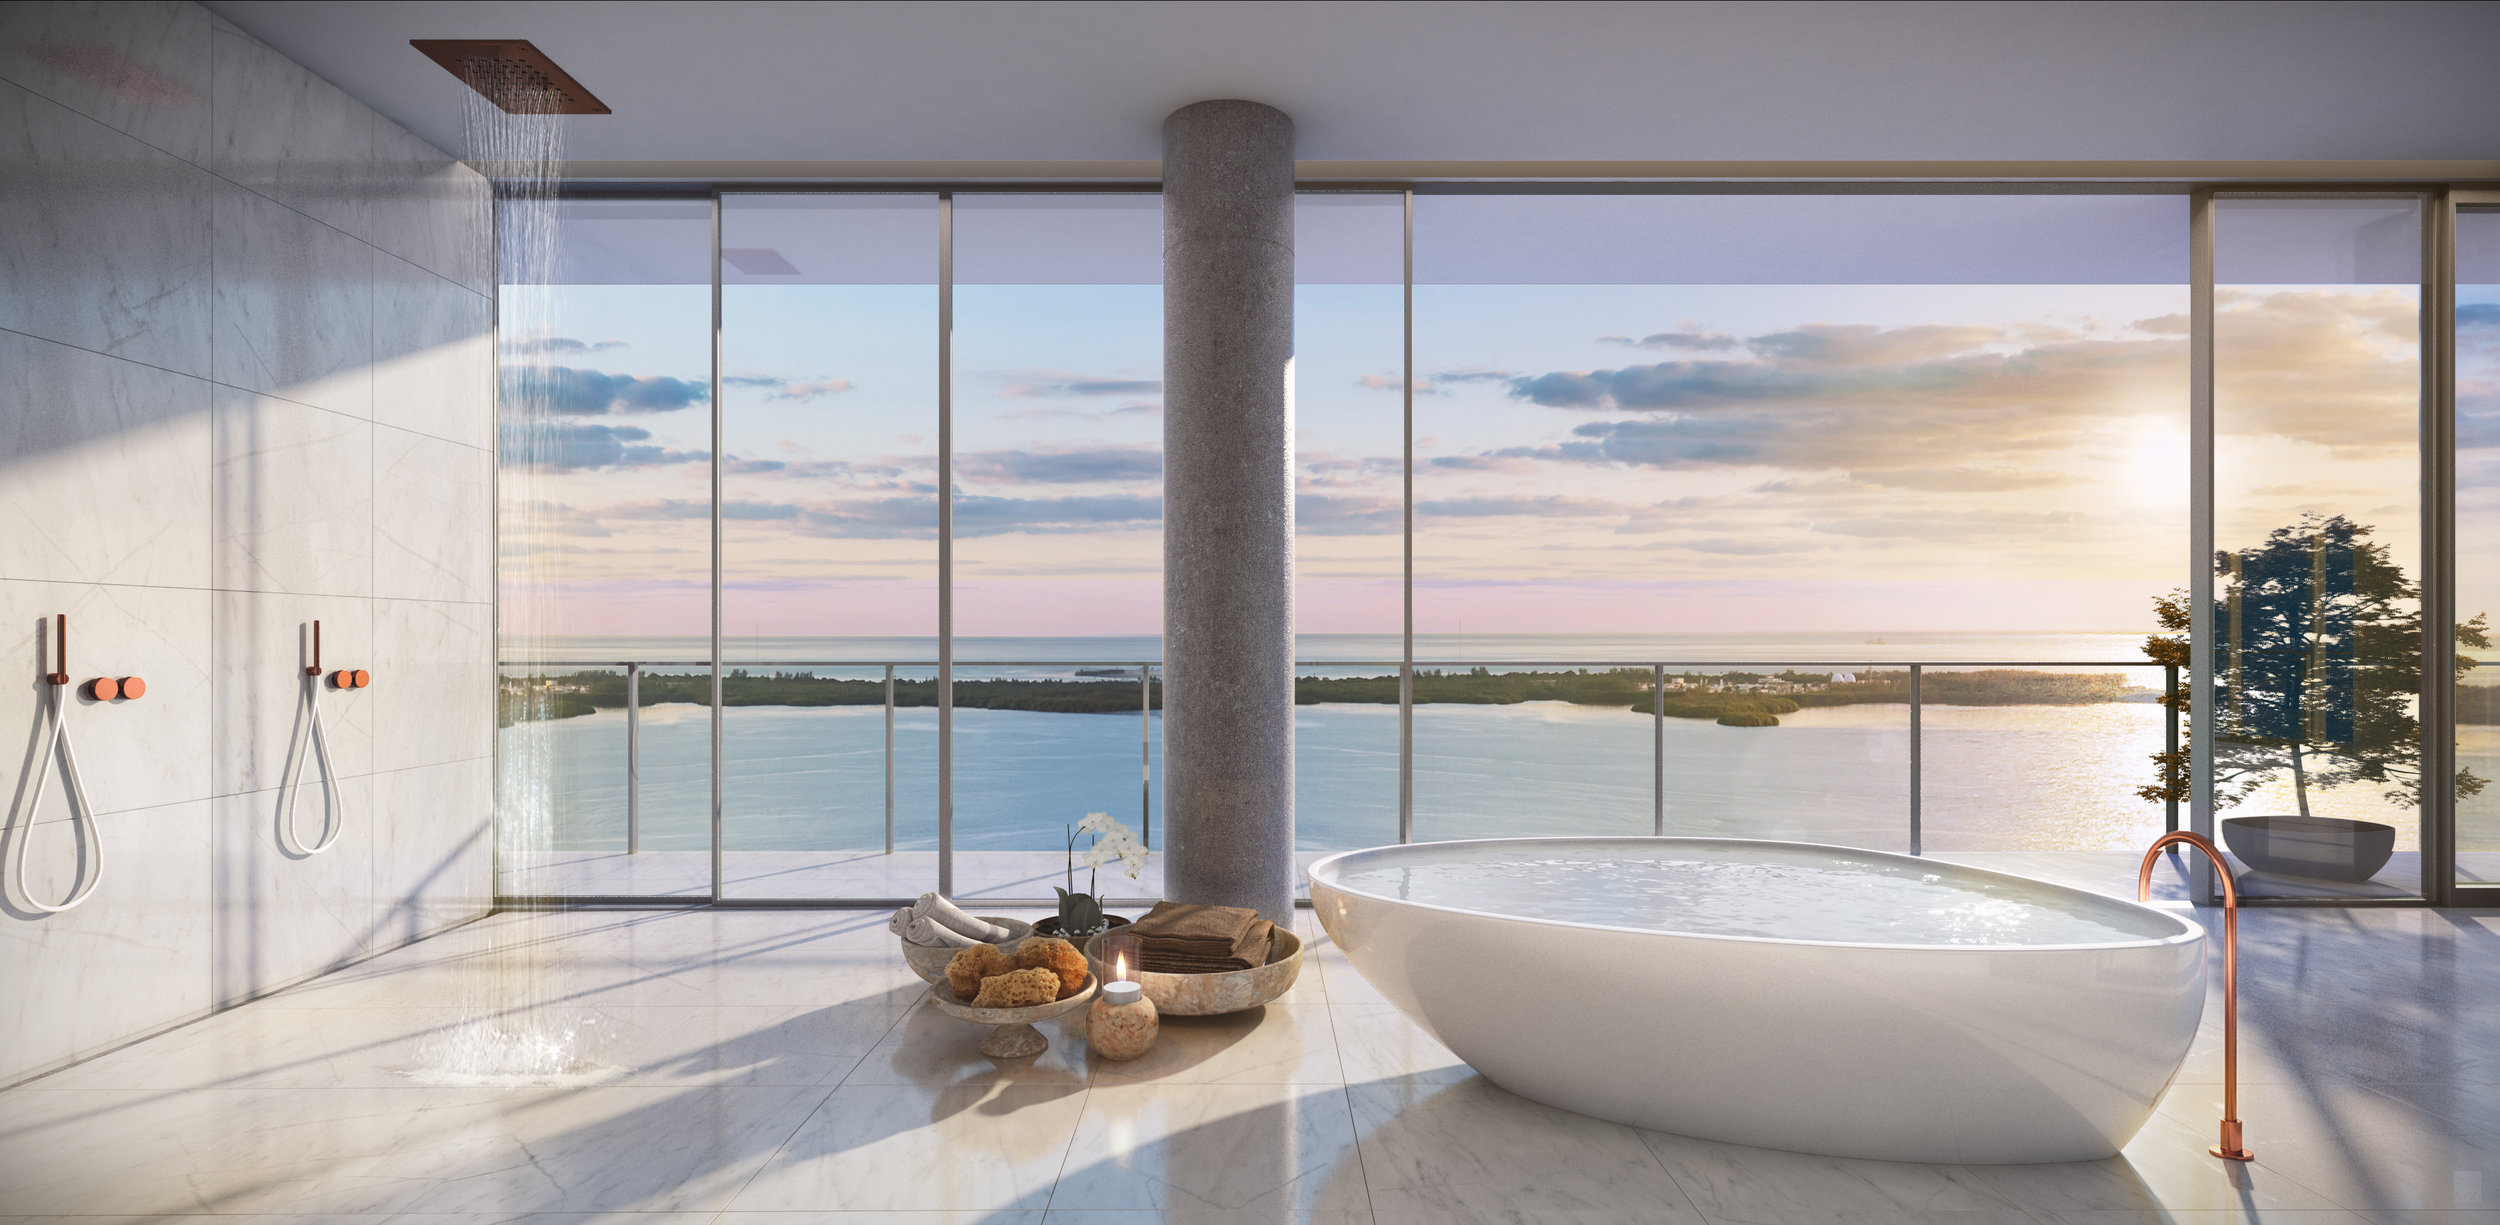 Terra's David Martin Lists His Custom, Catalina Echevarria-Designed Grove at Grand Bay Penthouse For $25 Million